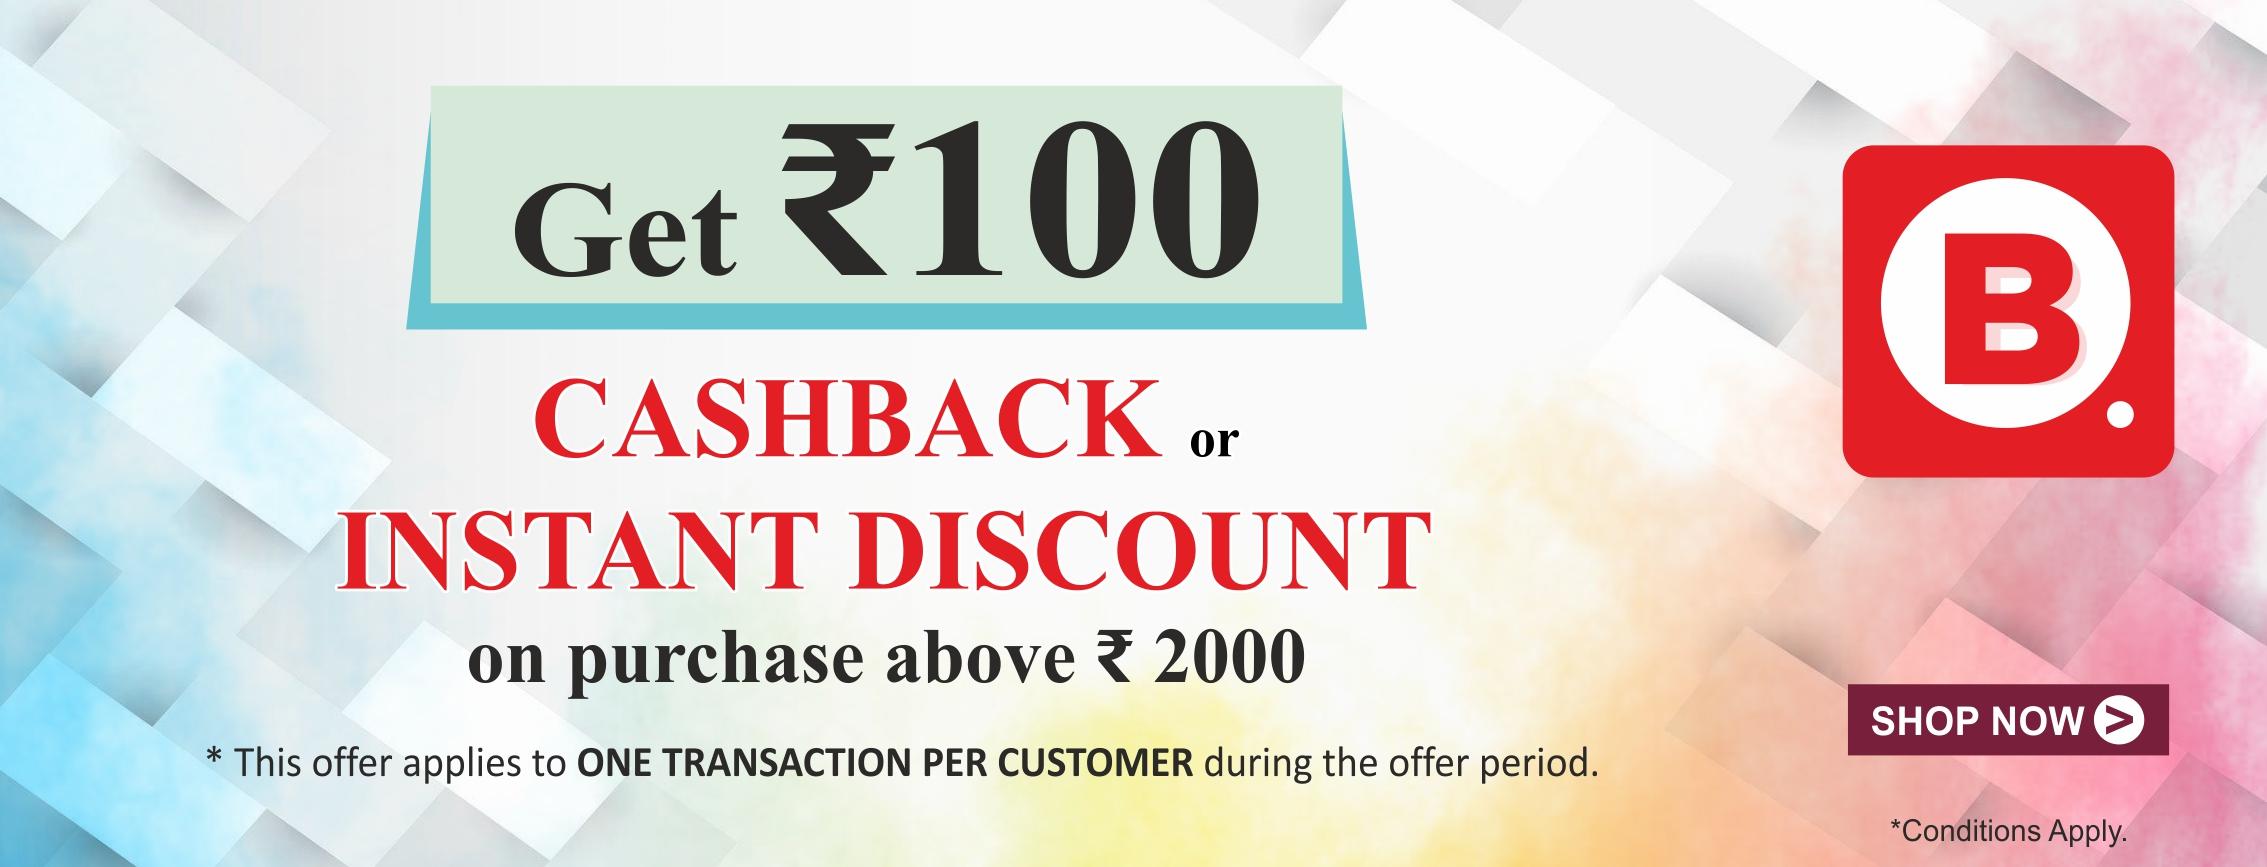 BigBFreshStore-Instant Discount and Cashback Coupon GRABON100